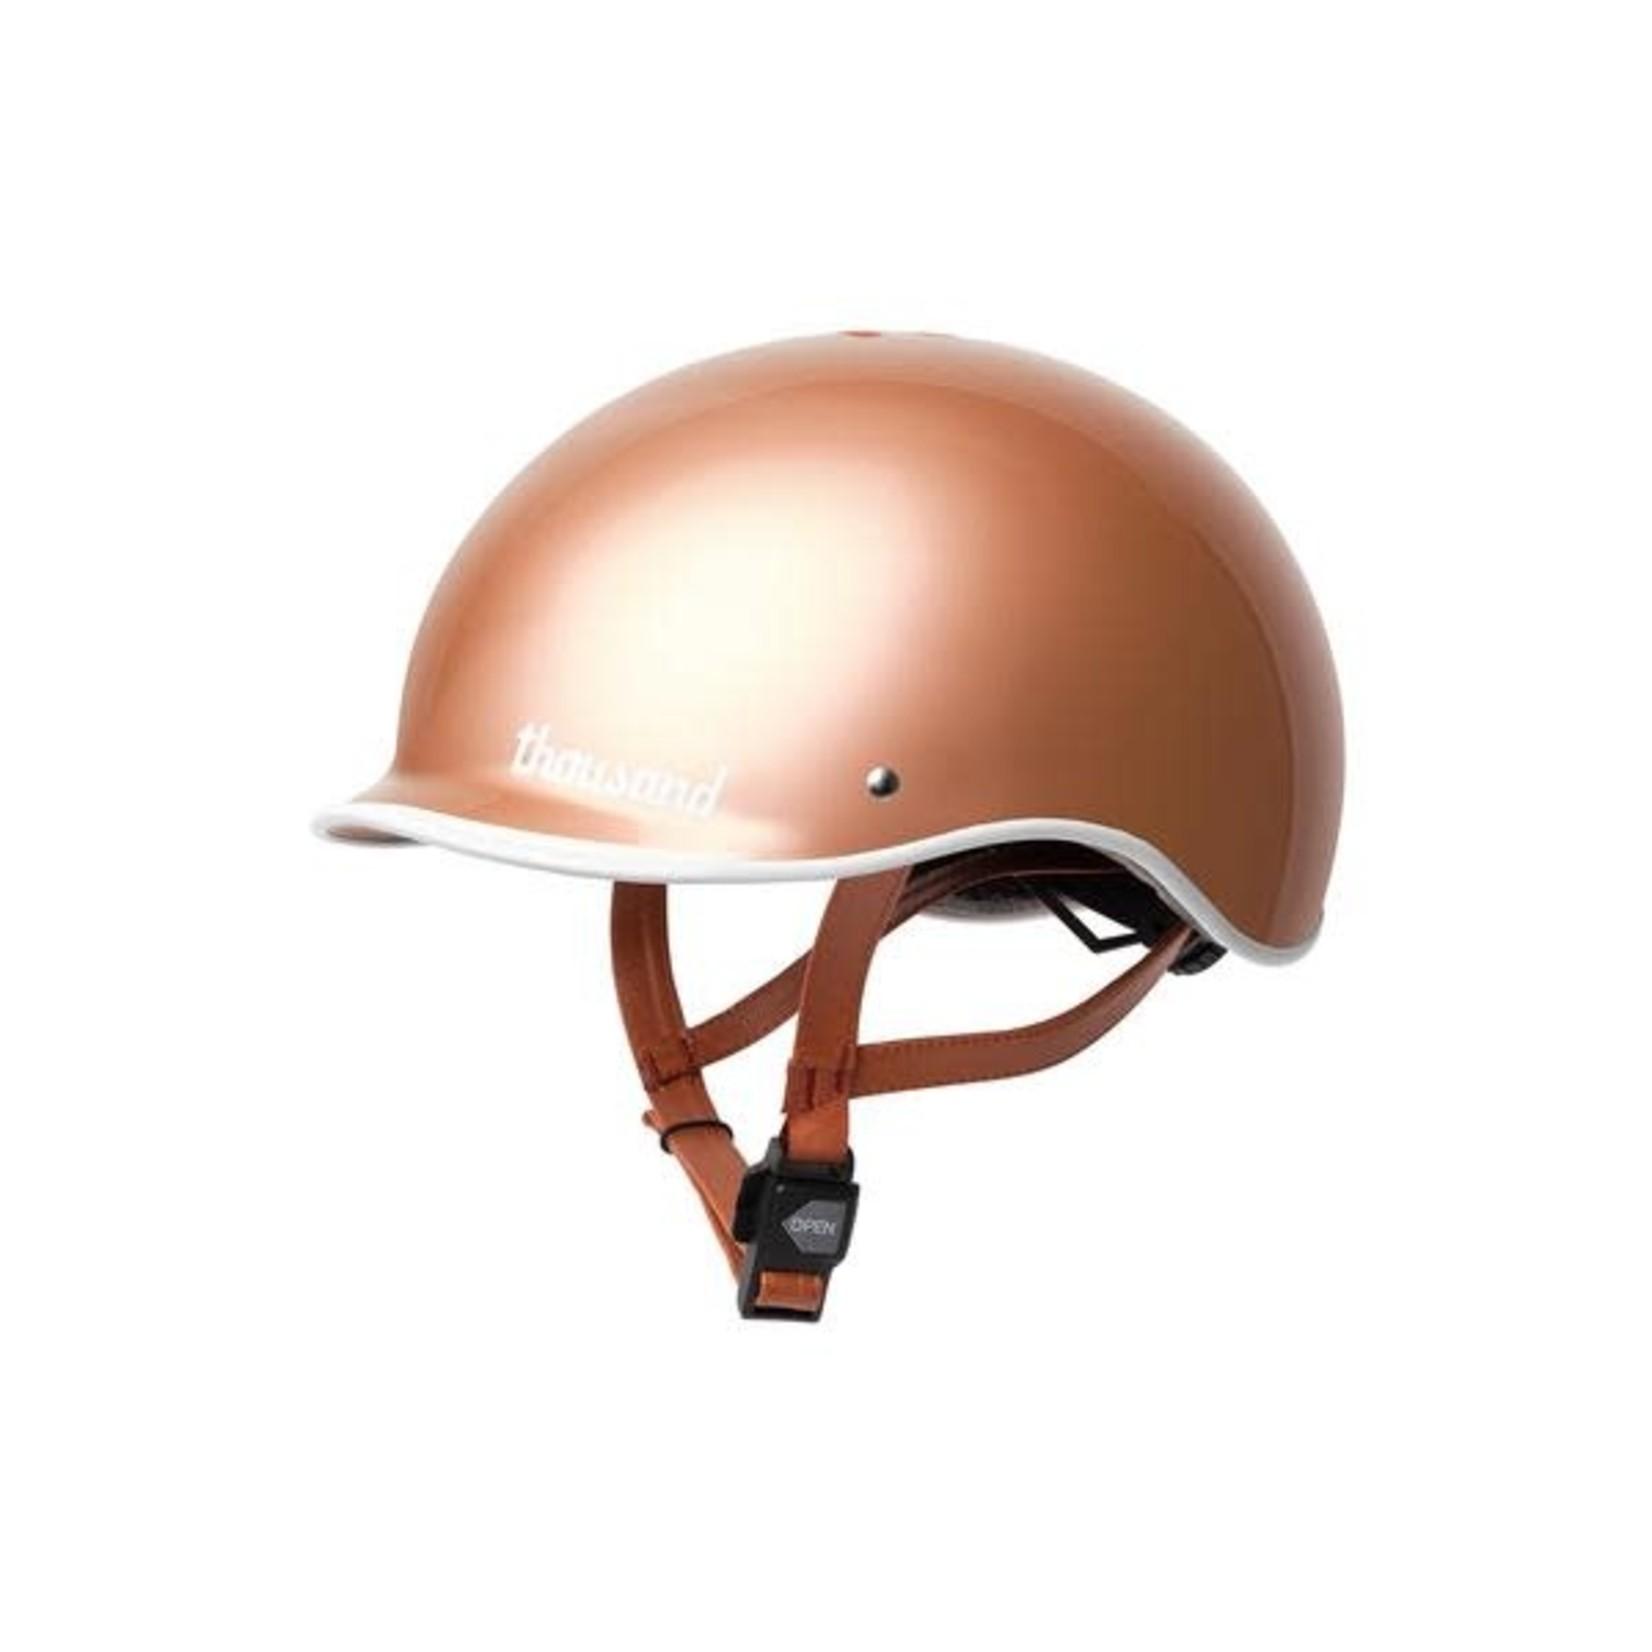 Thousand Thousand Metallics Collection Helmets